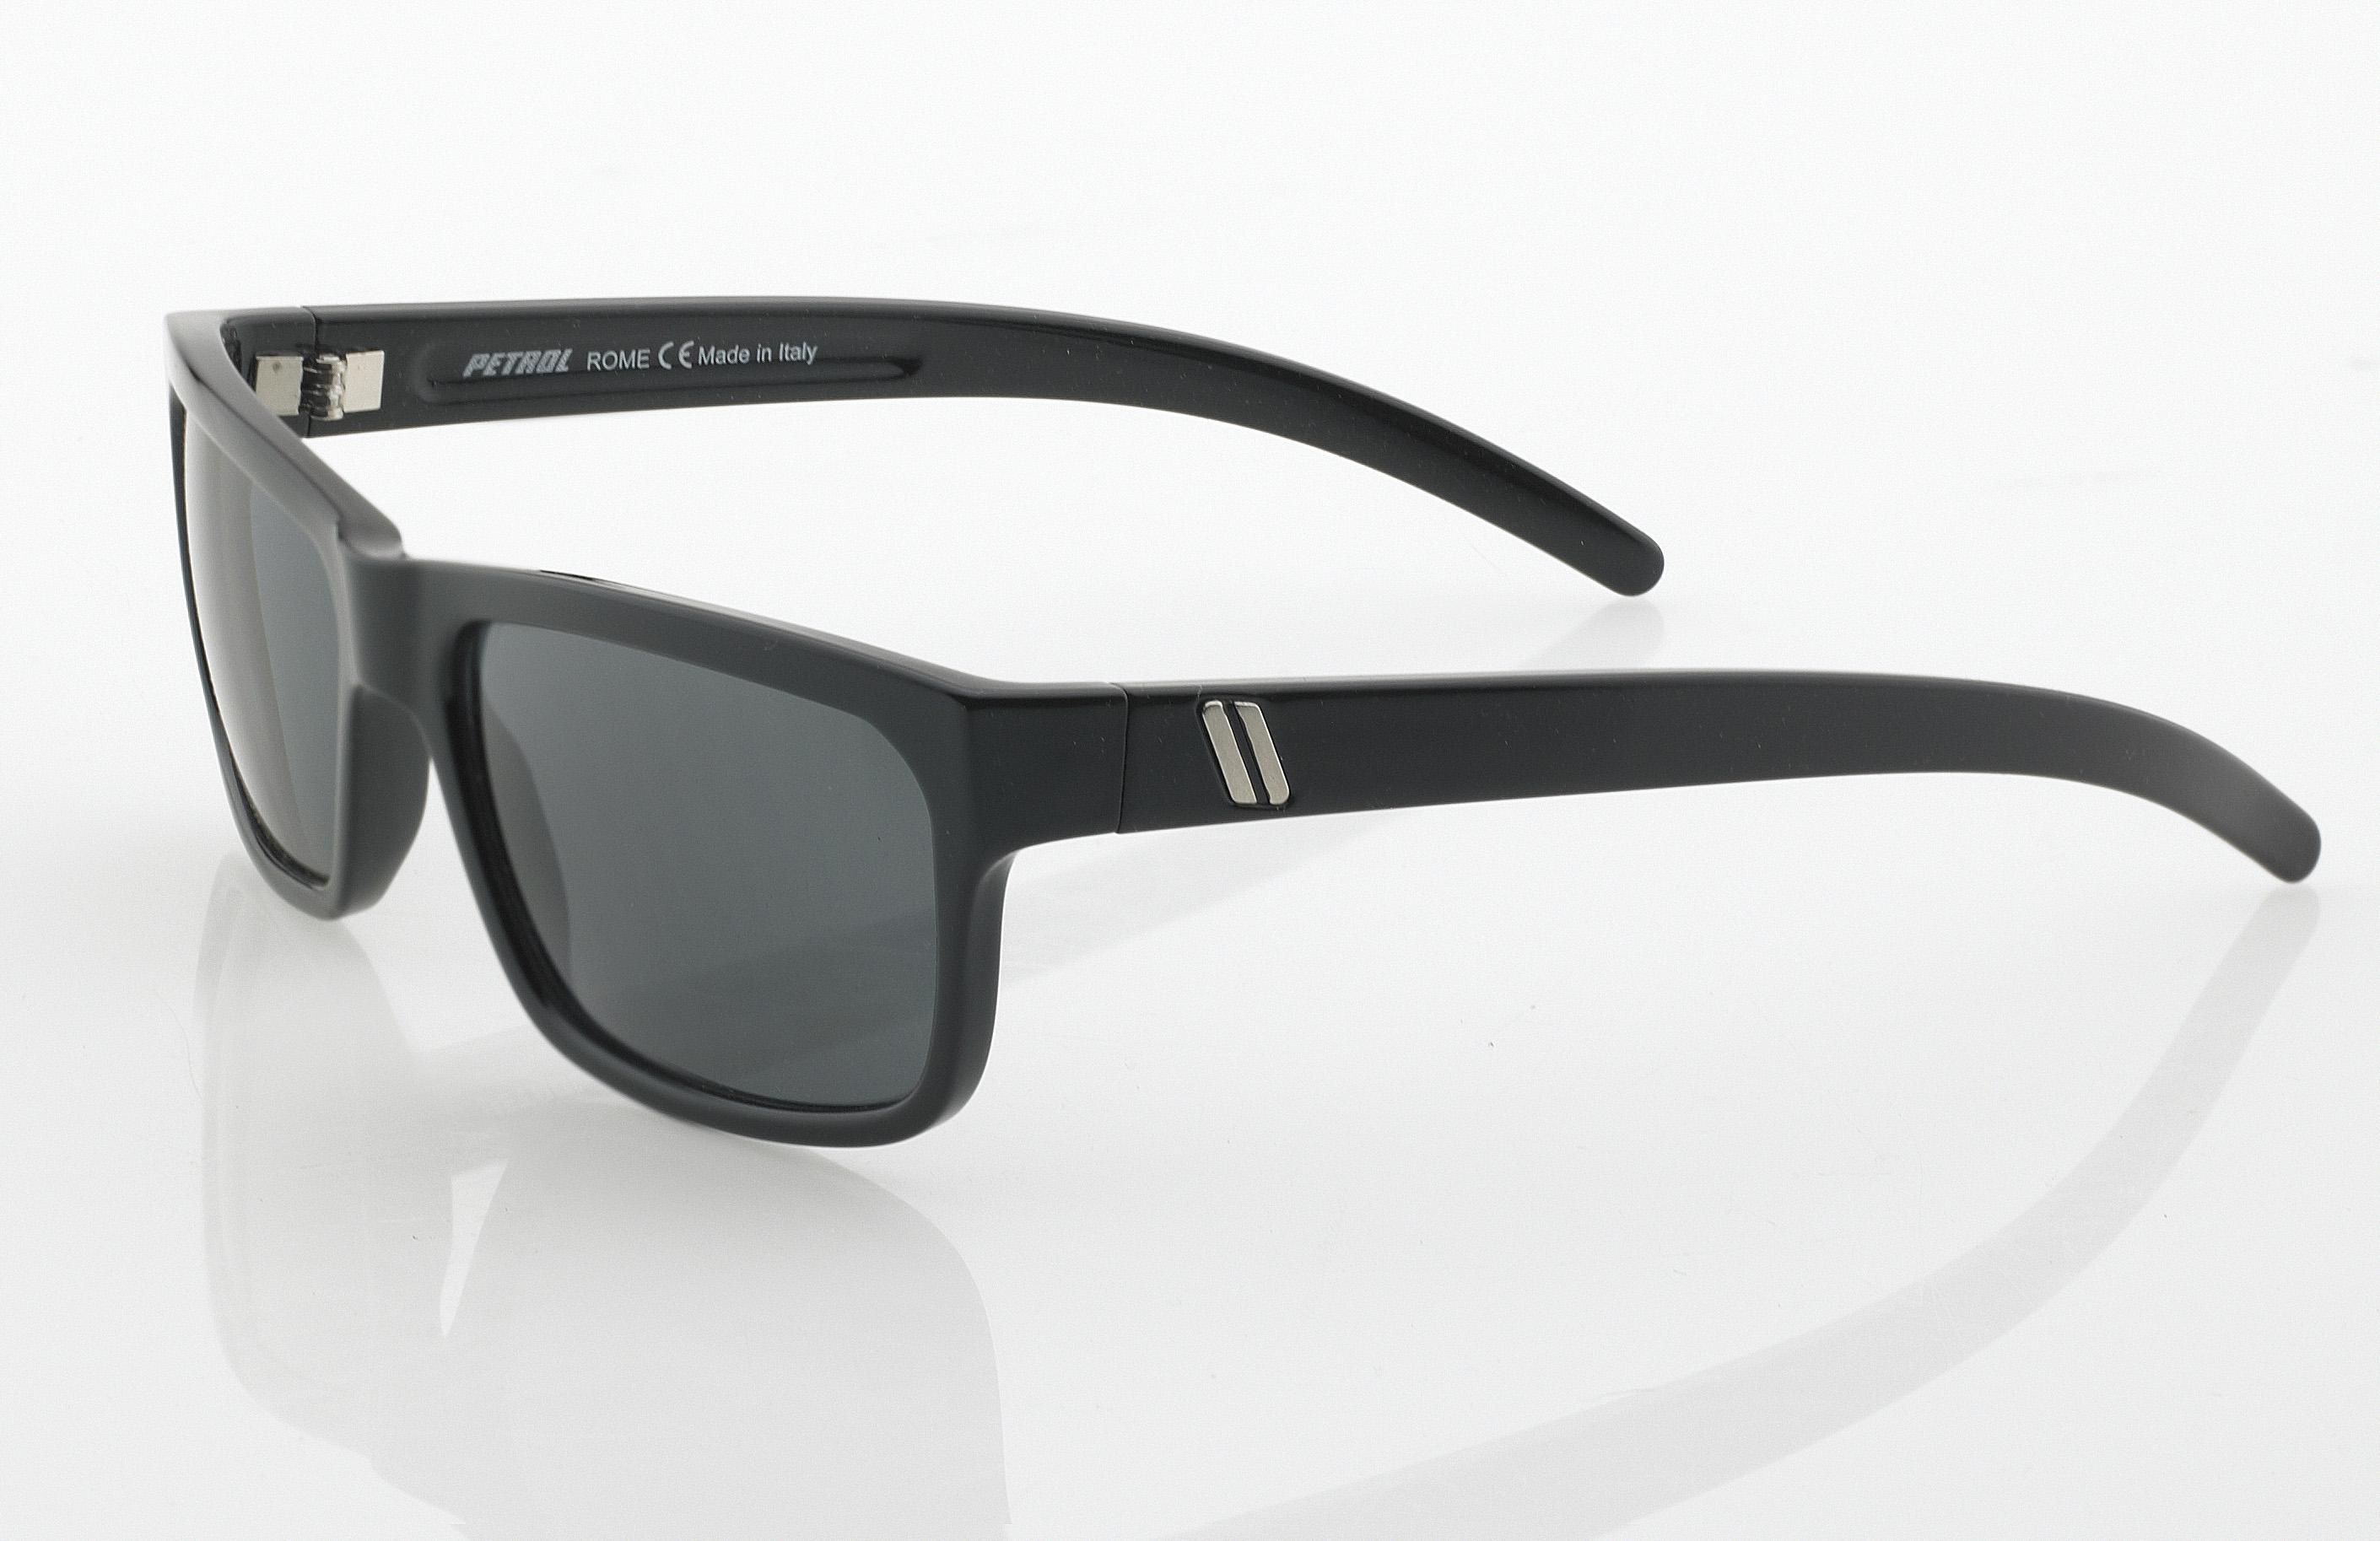 Sunglasses Eyewear H75t